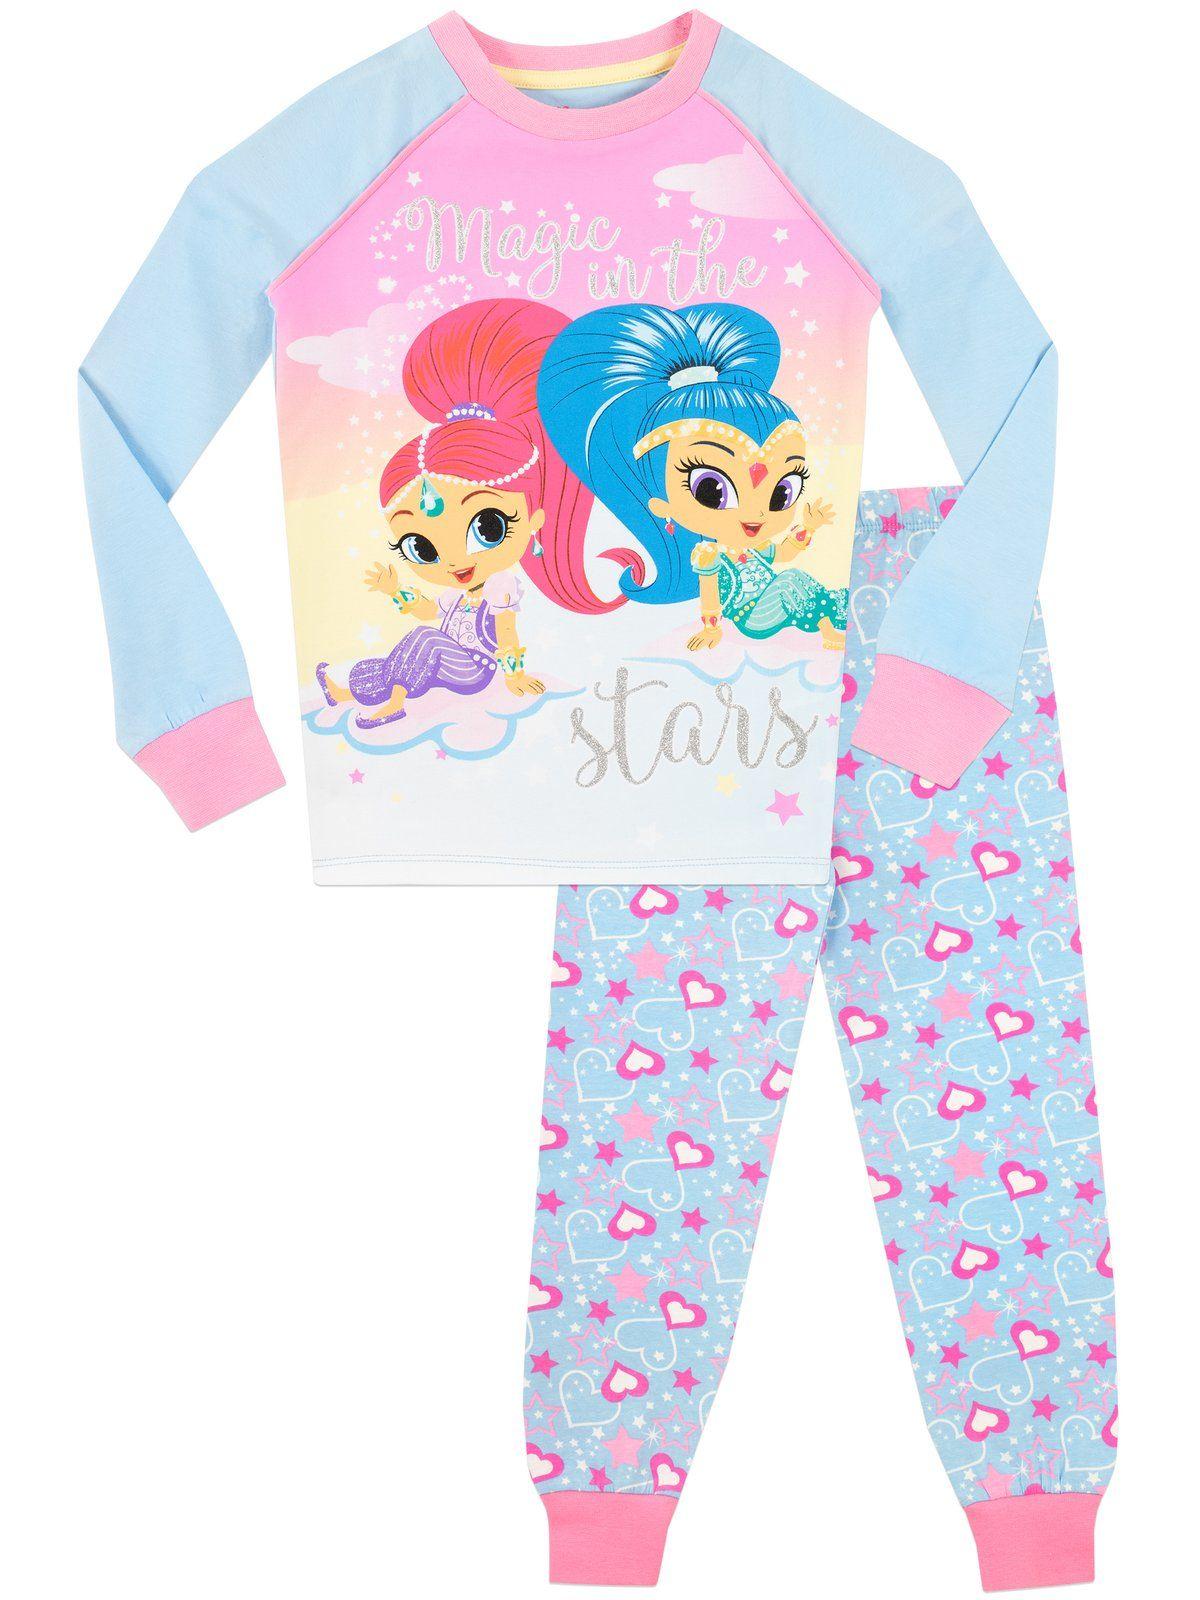 2 Pack Shimmer /& Shine Pyjamas Sizes 18 months 5 years